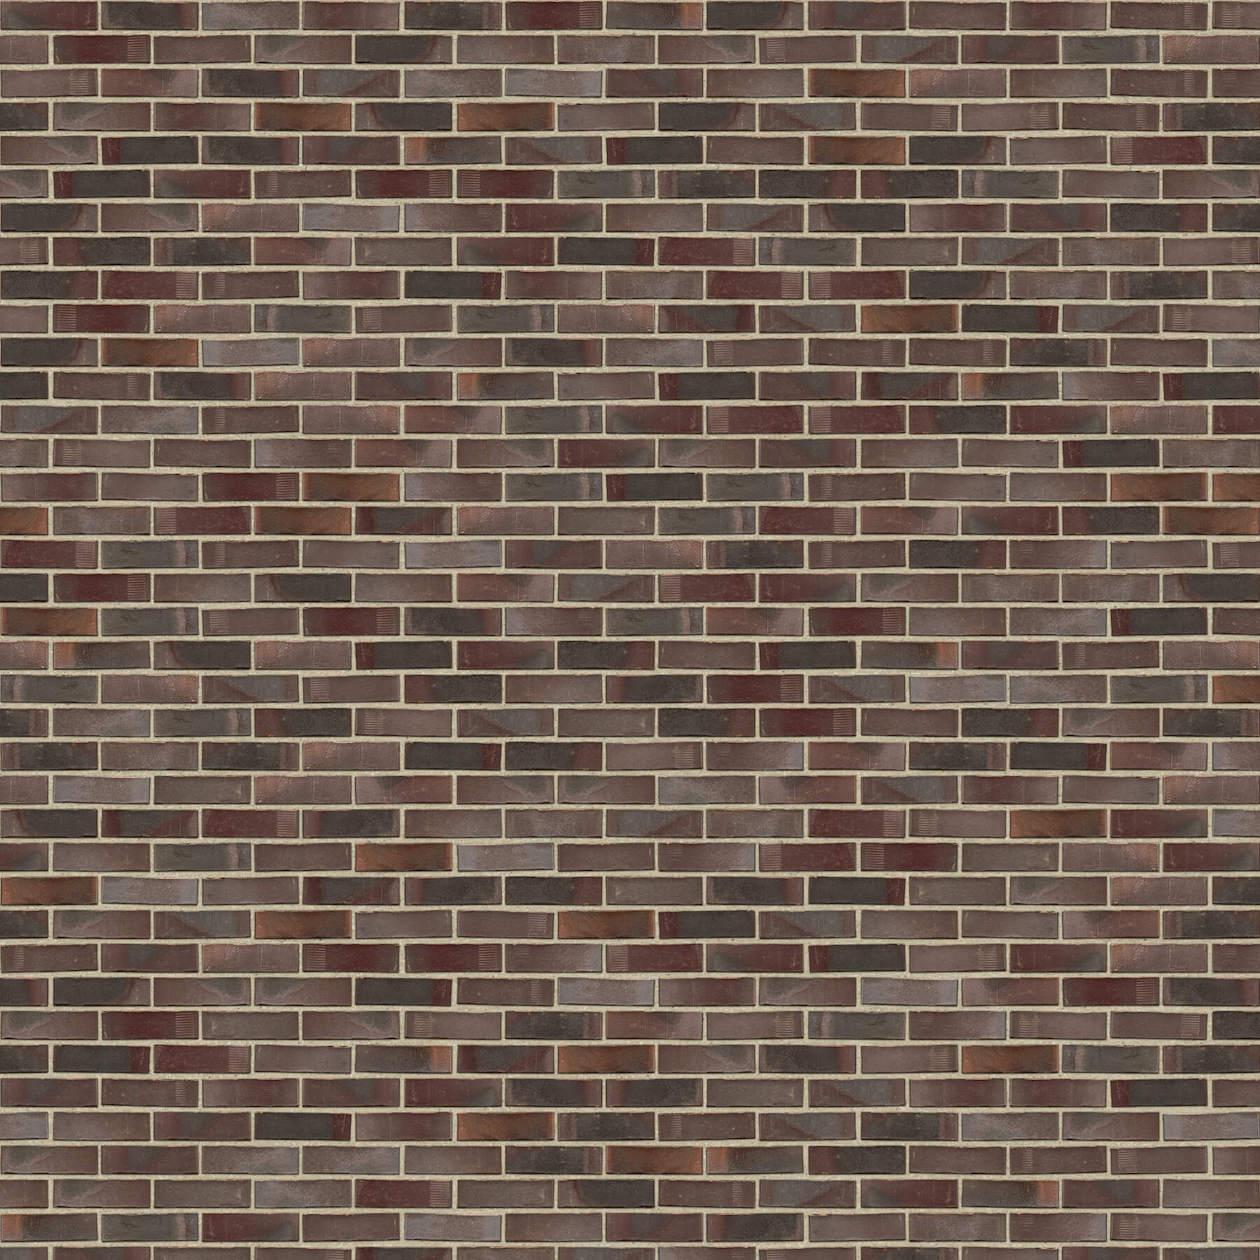 Puna-cigla-FeldHaus-Klinker-brick-house-nf-k-704-Bez Fuga